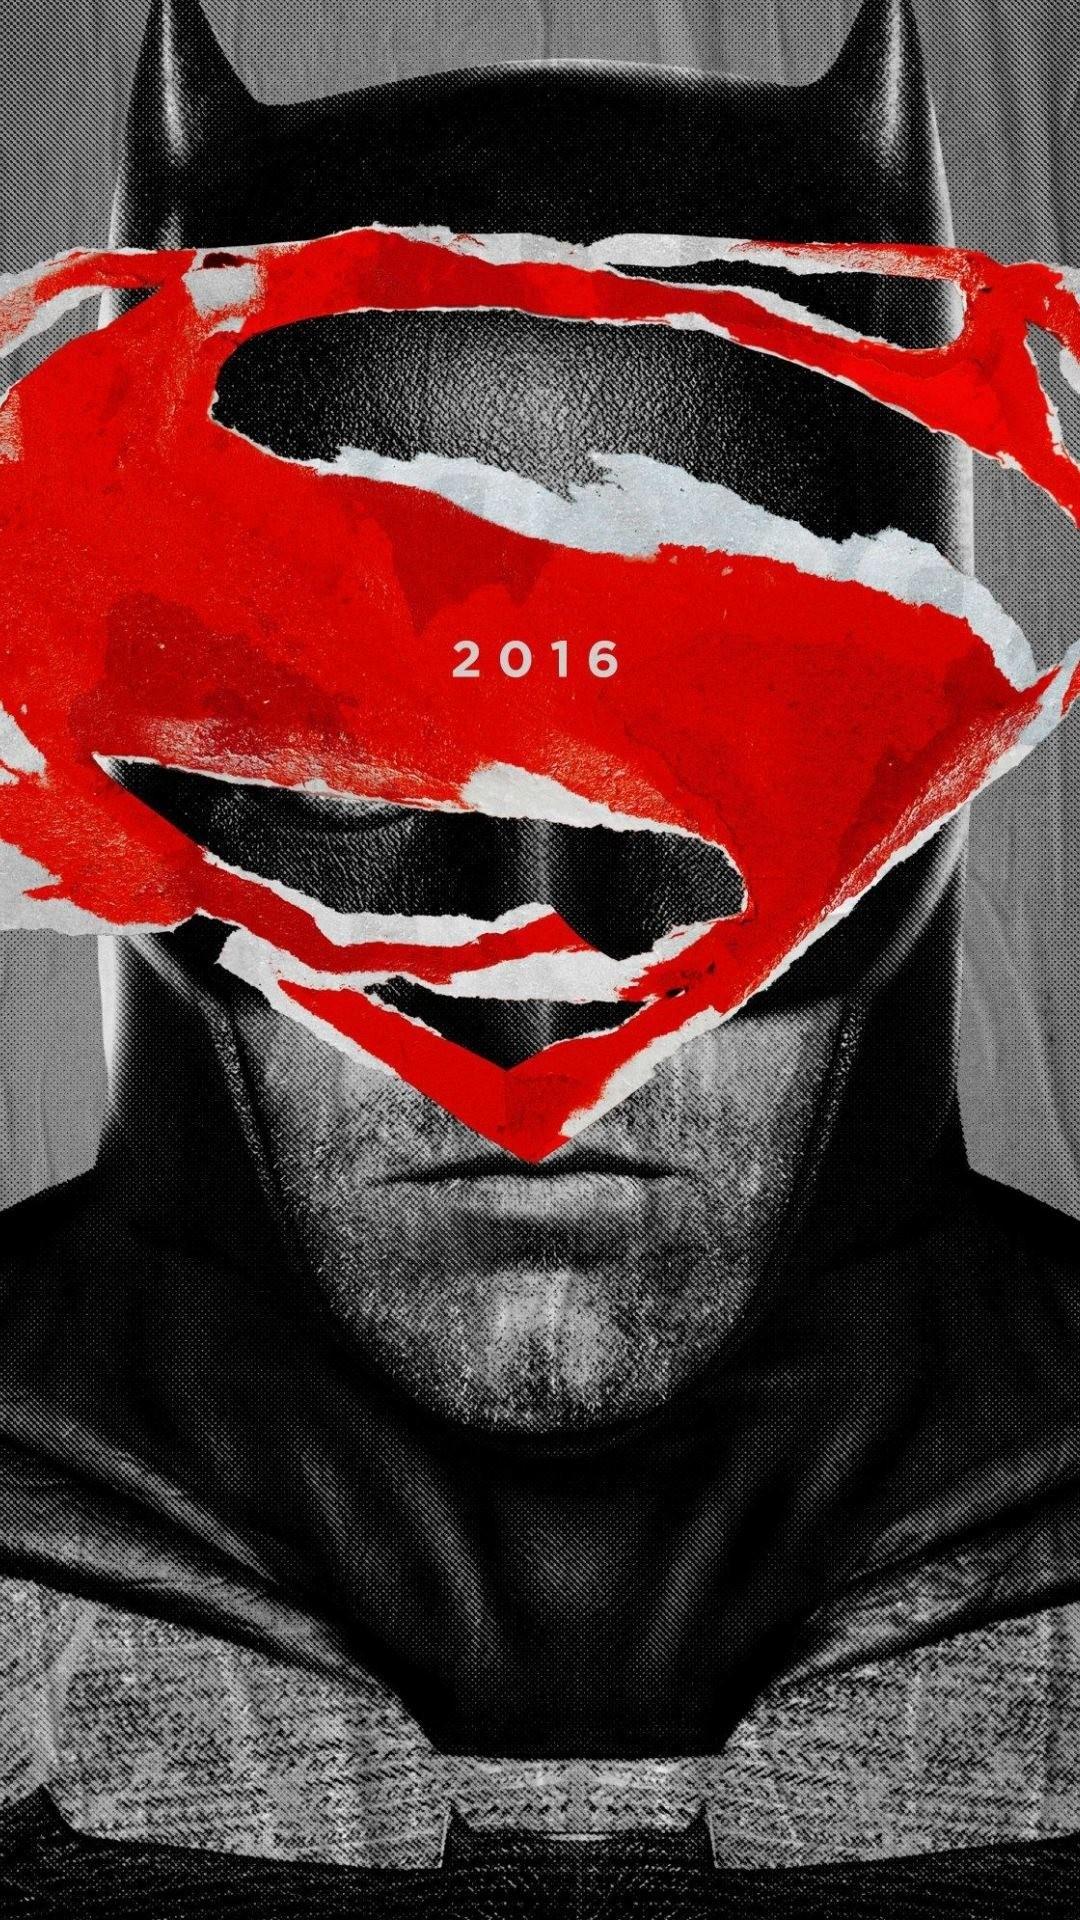 Batman VS Superman HD Wallpapers for Galaxy S4 / S5 ...